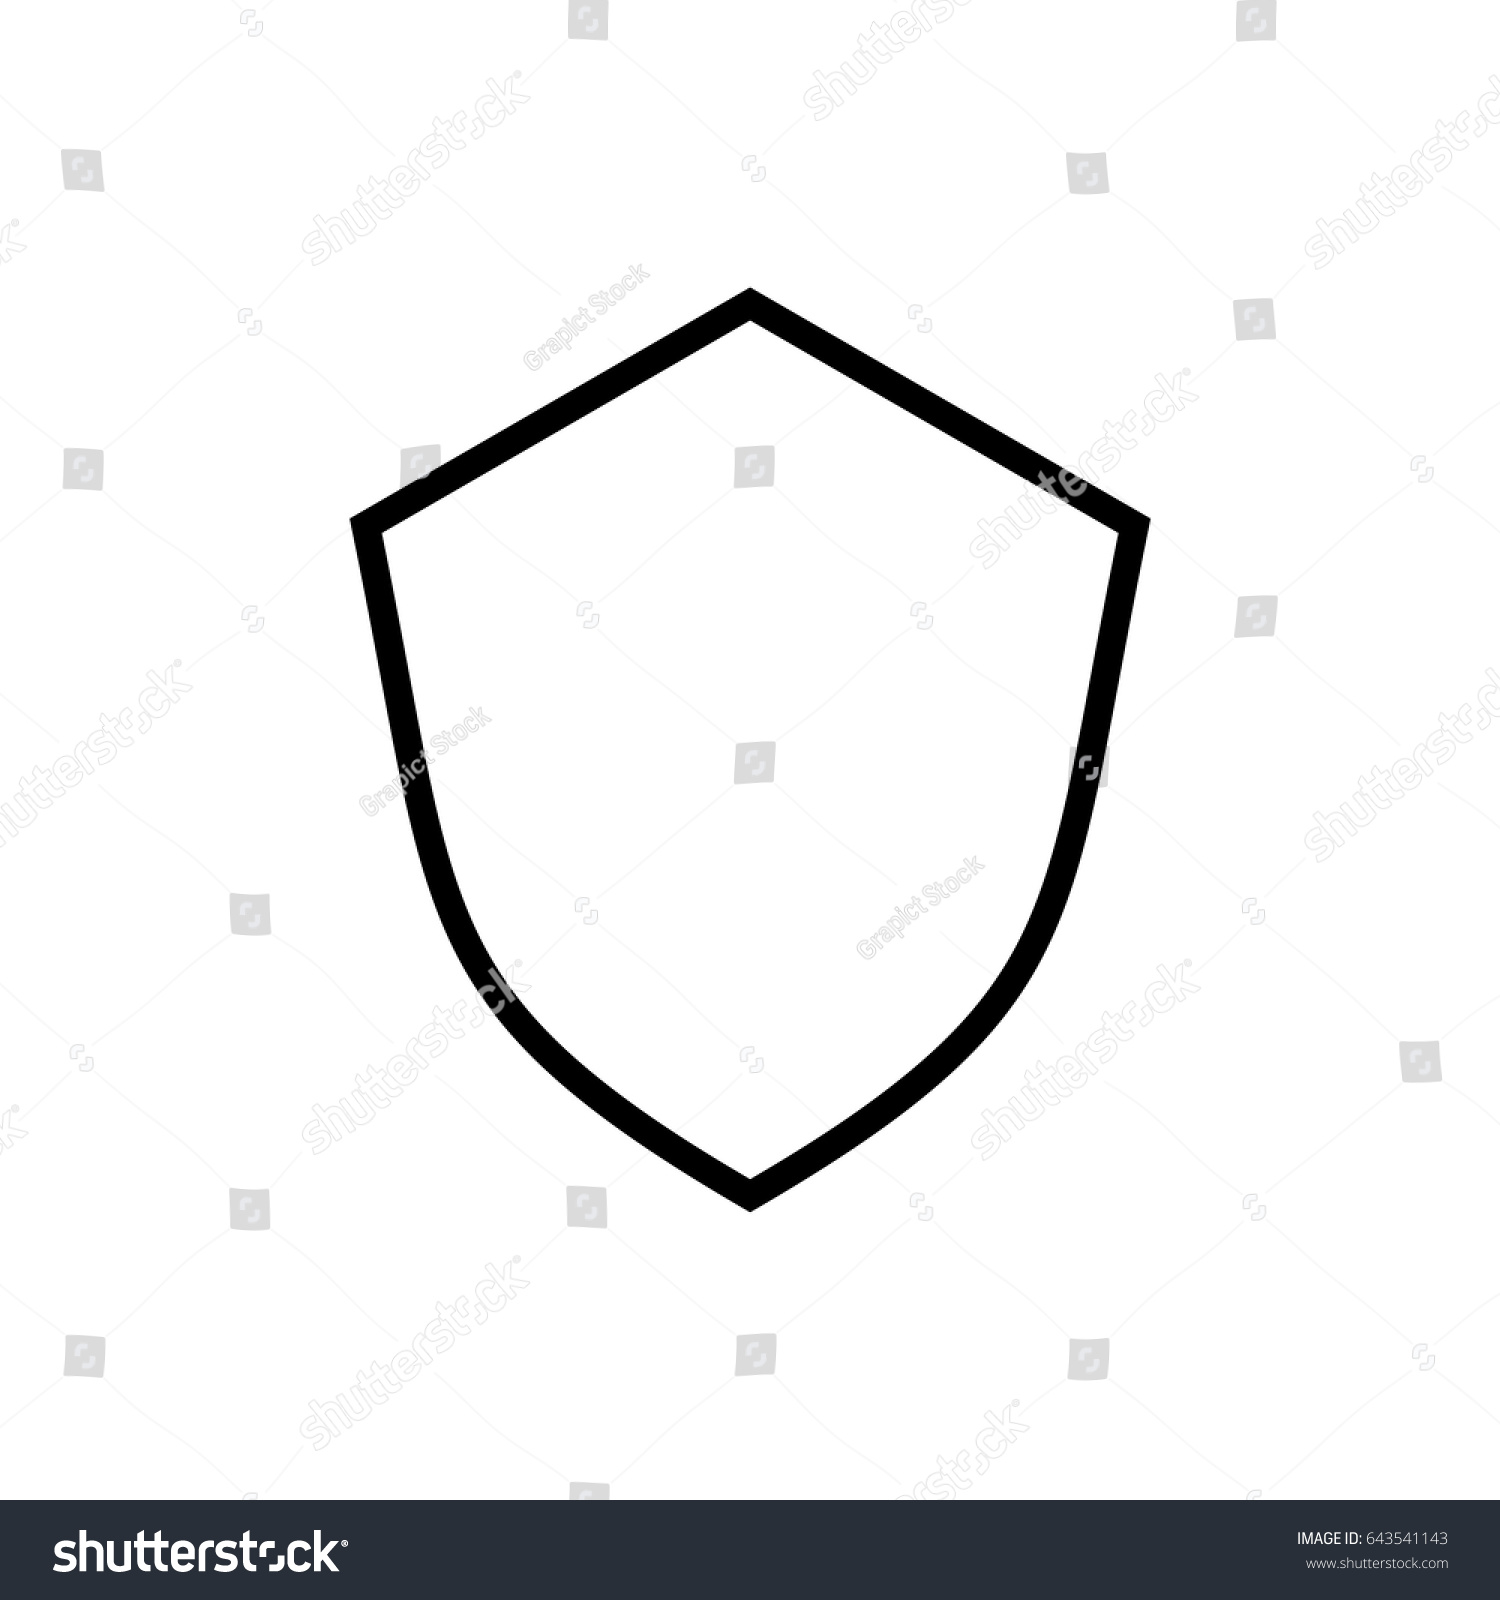 Shield Template Ii Stock Vector HD (Royalty Free) 643541143 ...